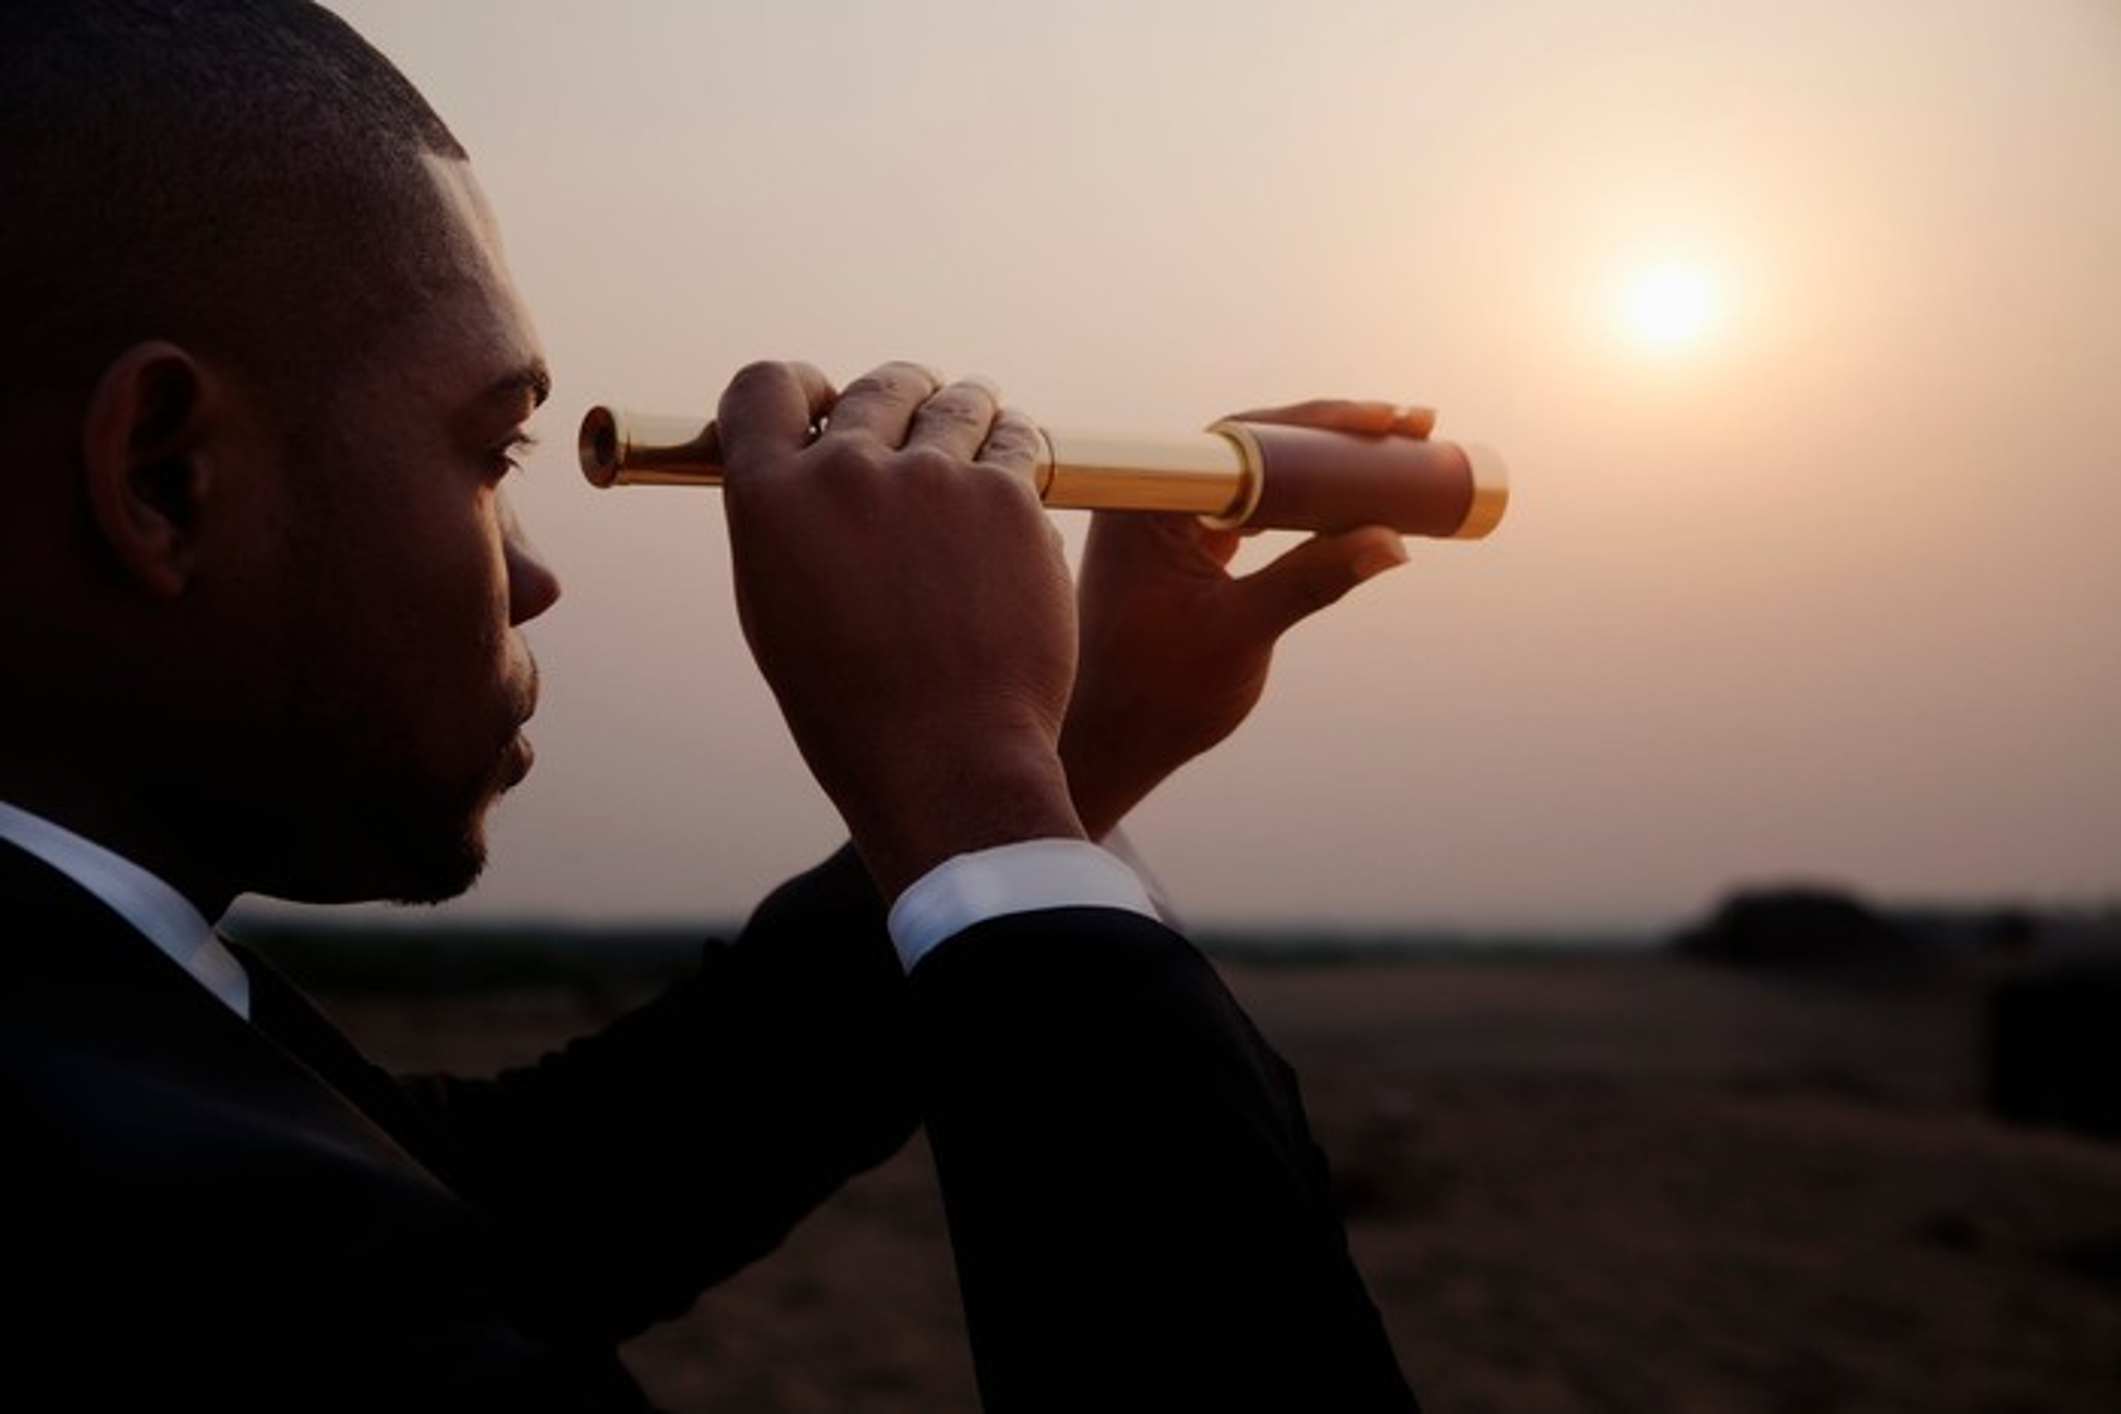 man in business suit looking through telescope toward horizon